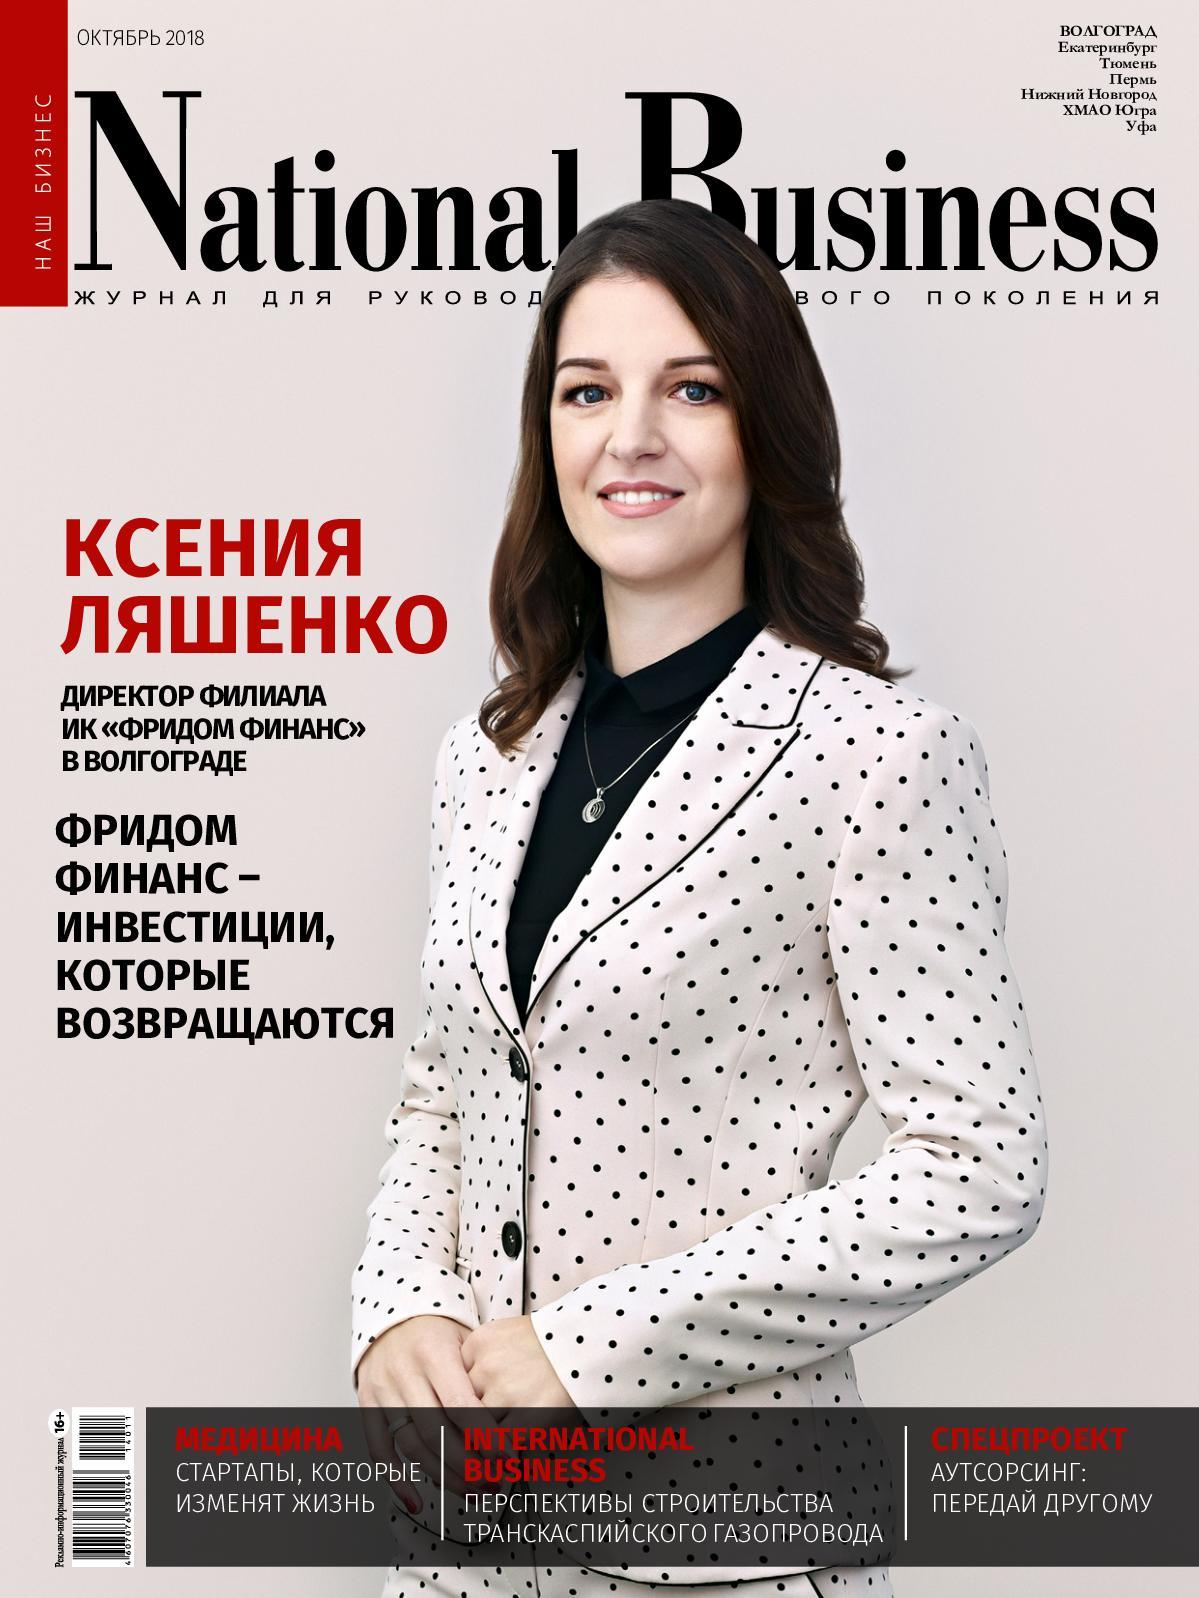 0d4d7ce7d02 Calaméo - National Business Волгоград октябрь 2018